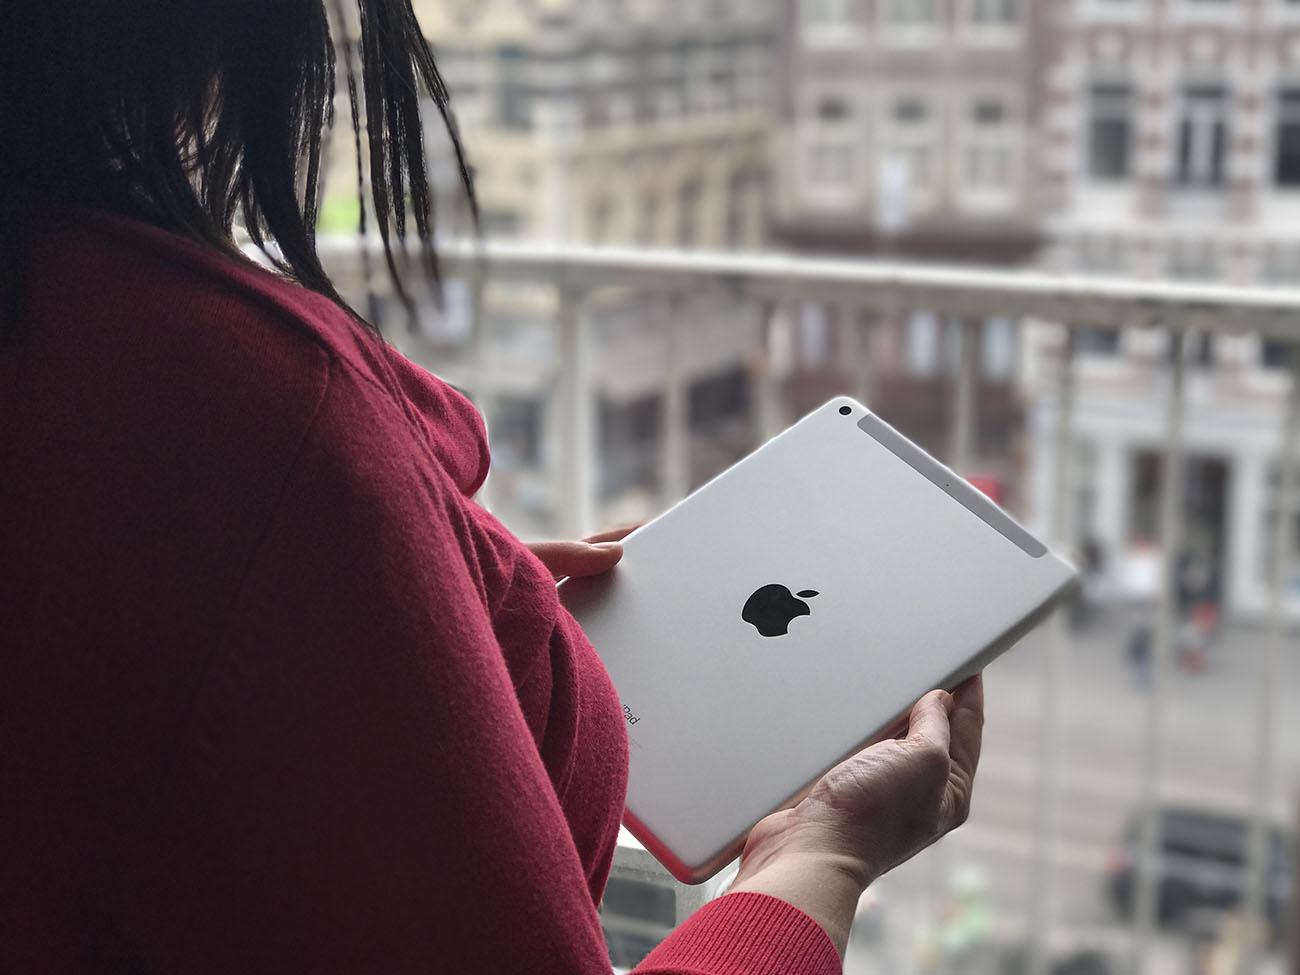 iPad 2017 review: achterkant van de iPad